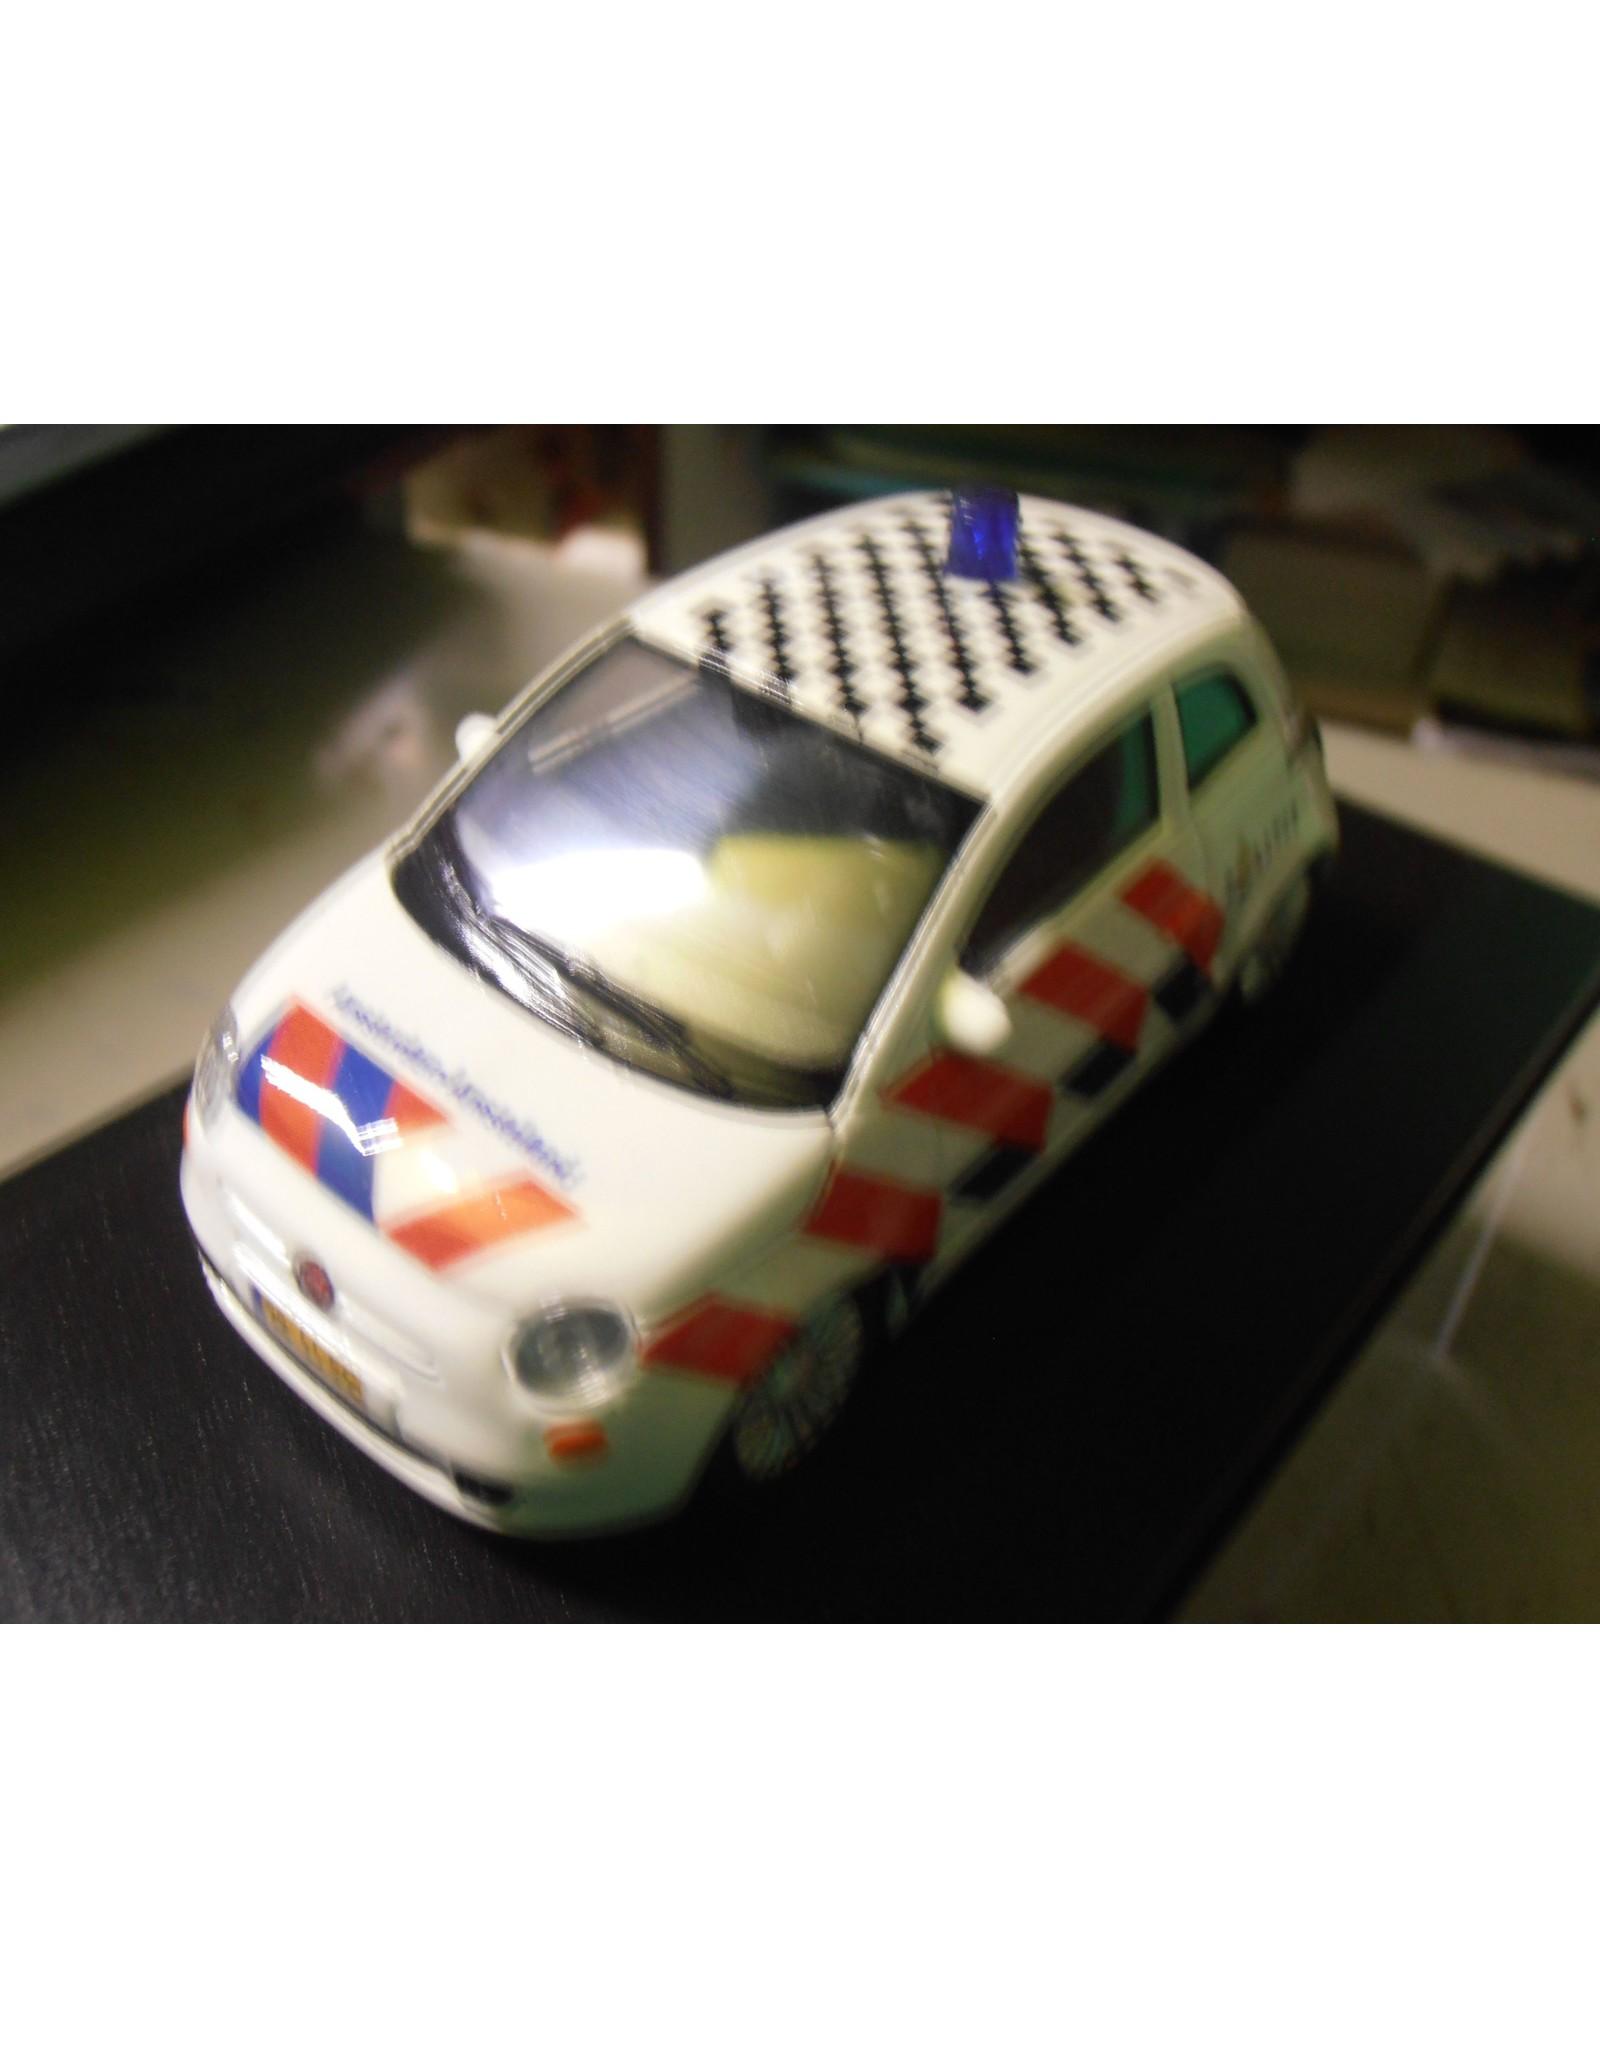 "Fiat FIAT 500 POLITIE ROTTERDAM-AMSTELLAND"""""